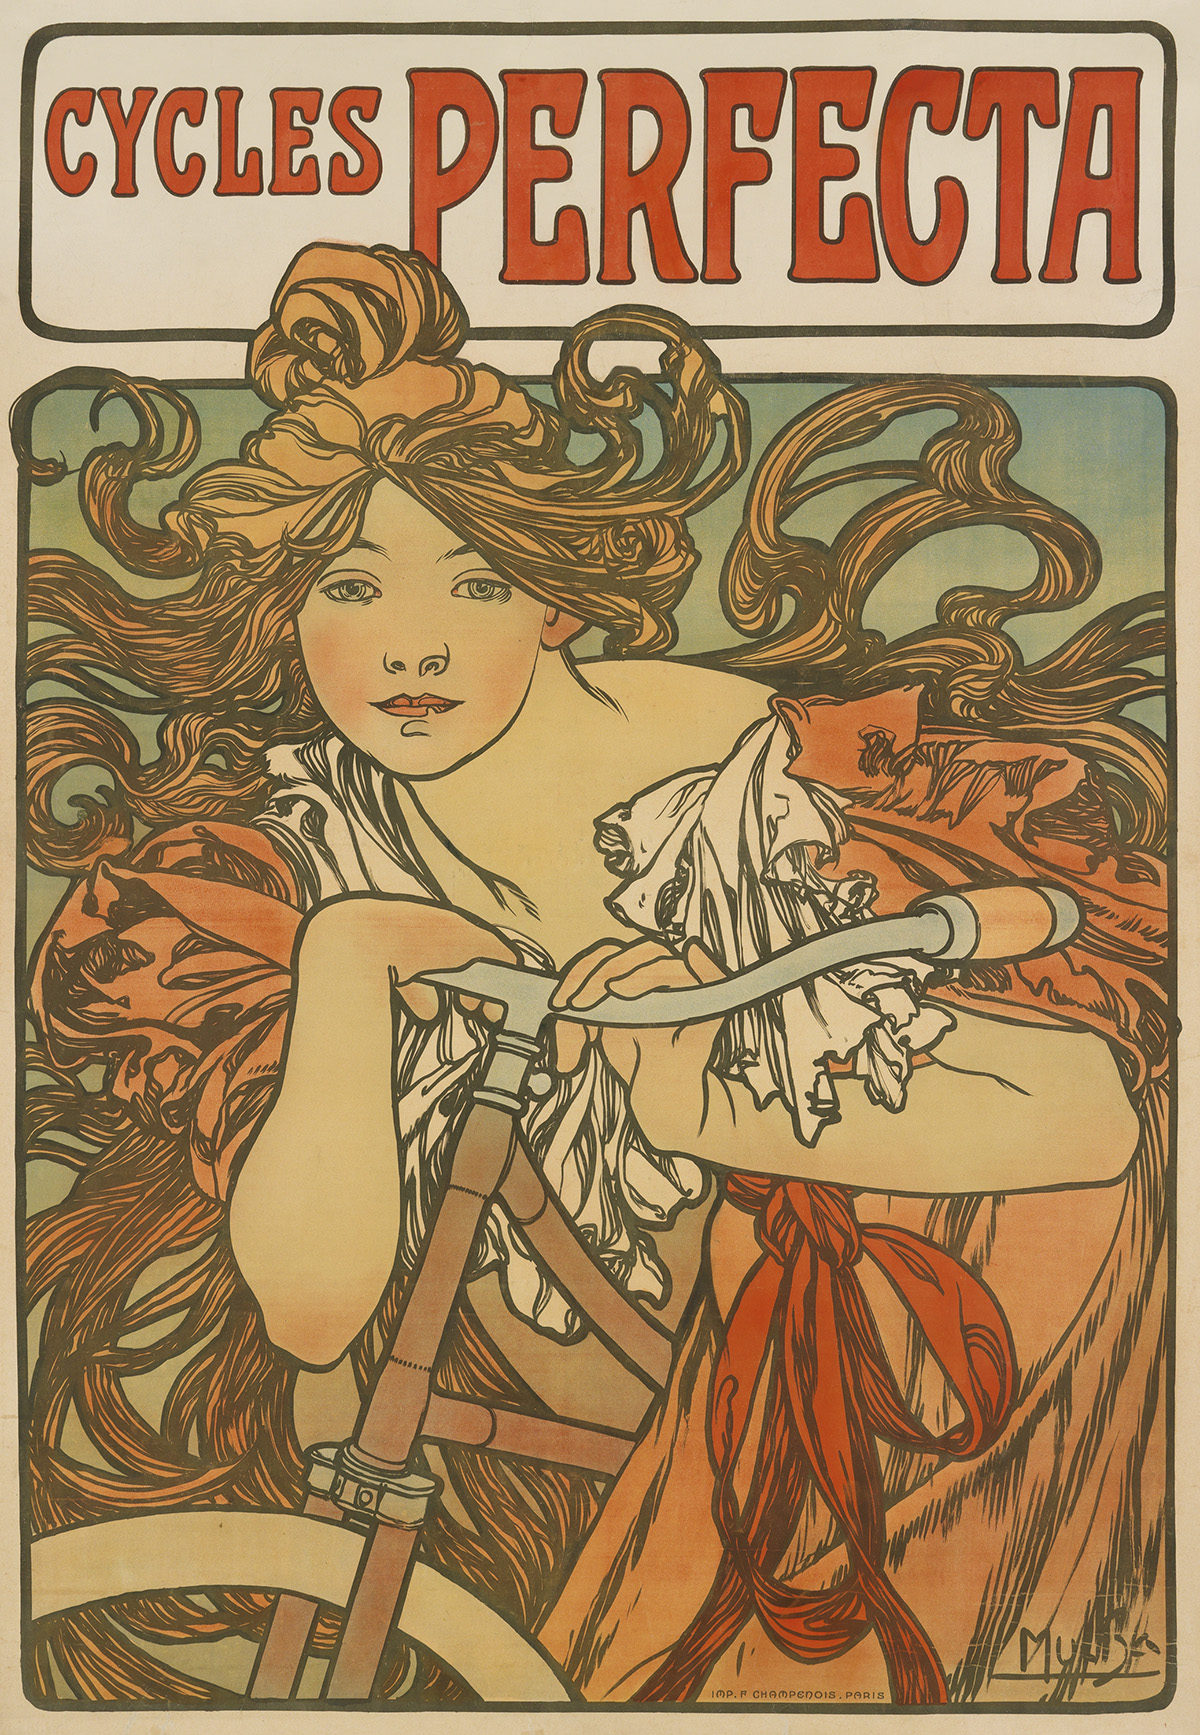 ALPHONSE-MUCHA-(1860-1939)-CYCLES-PERFECTA-1897-57x39-inches